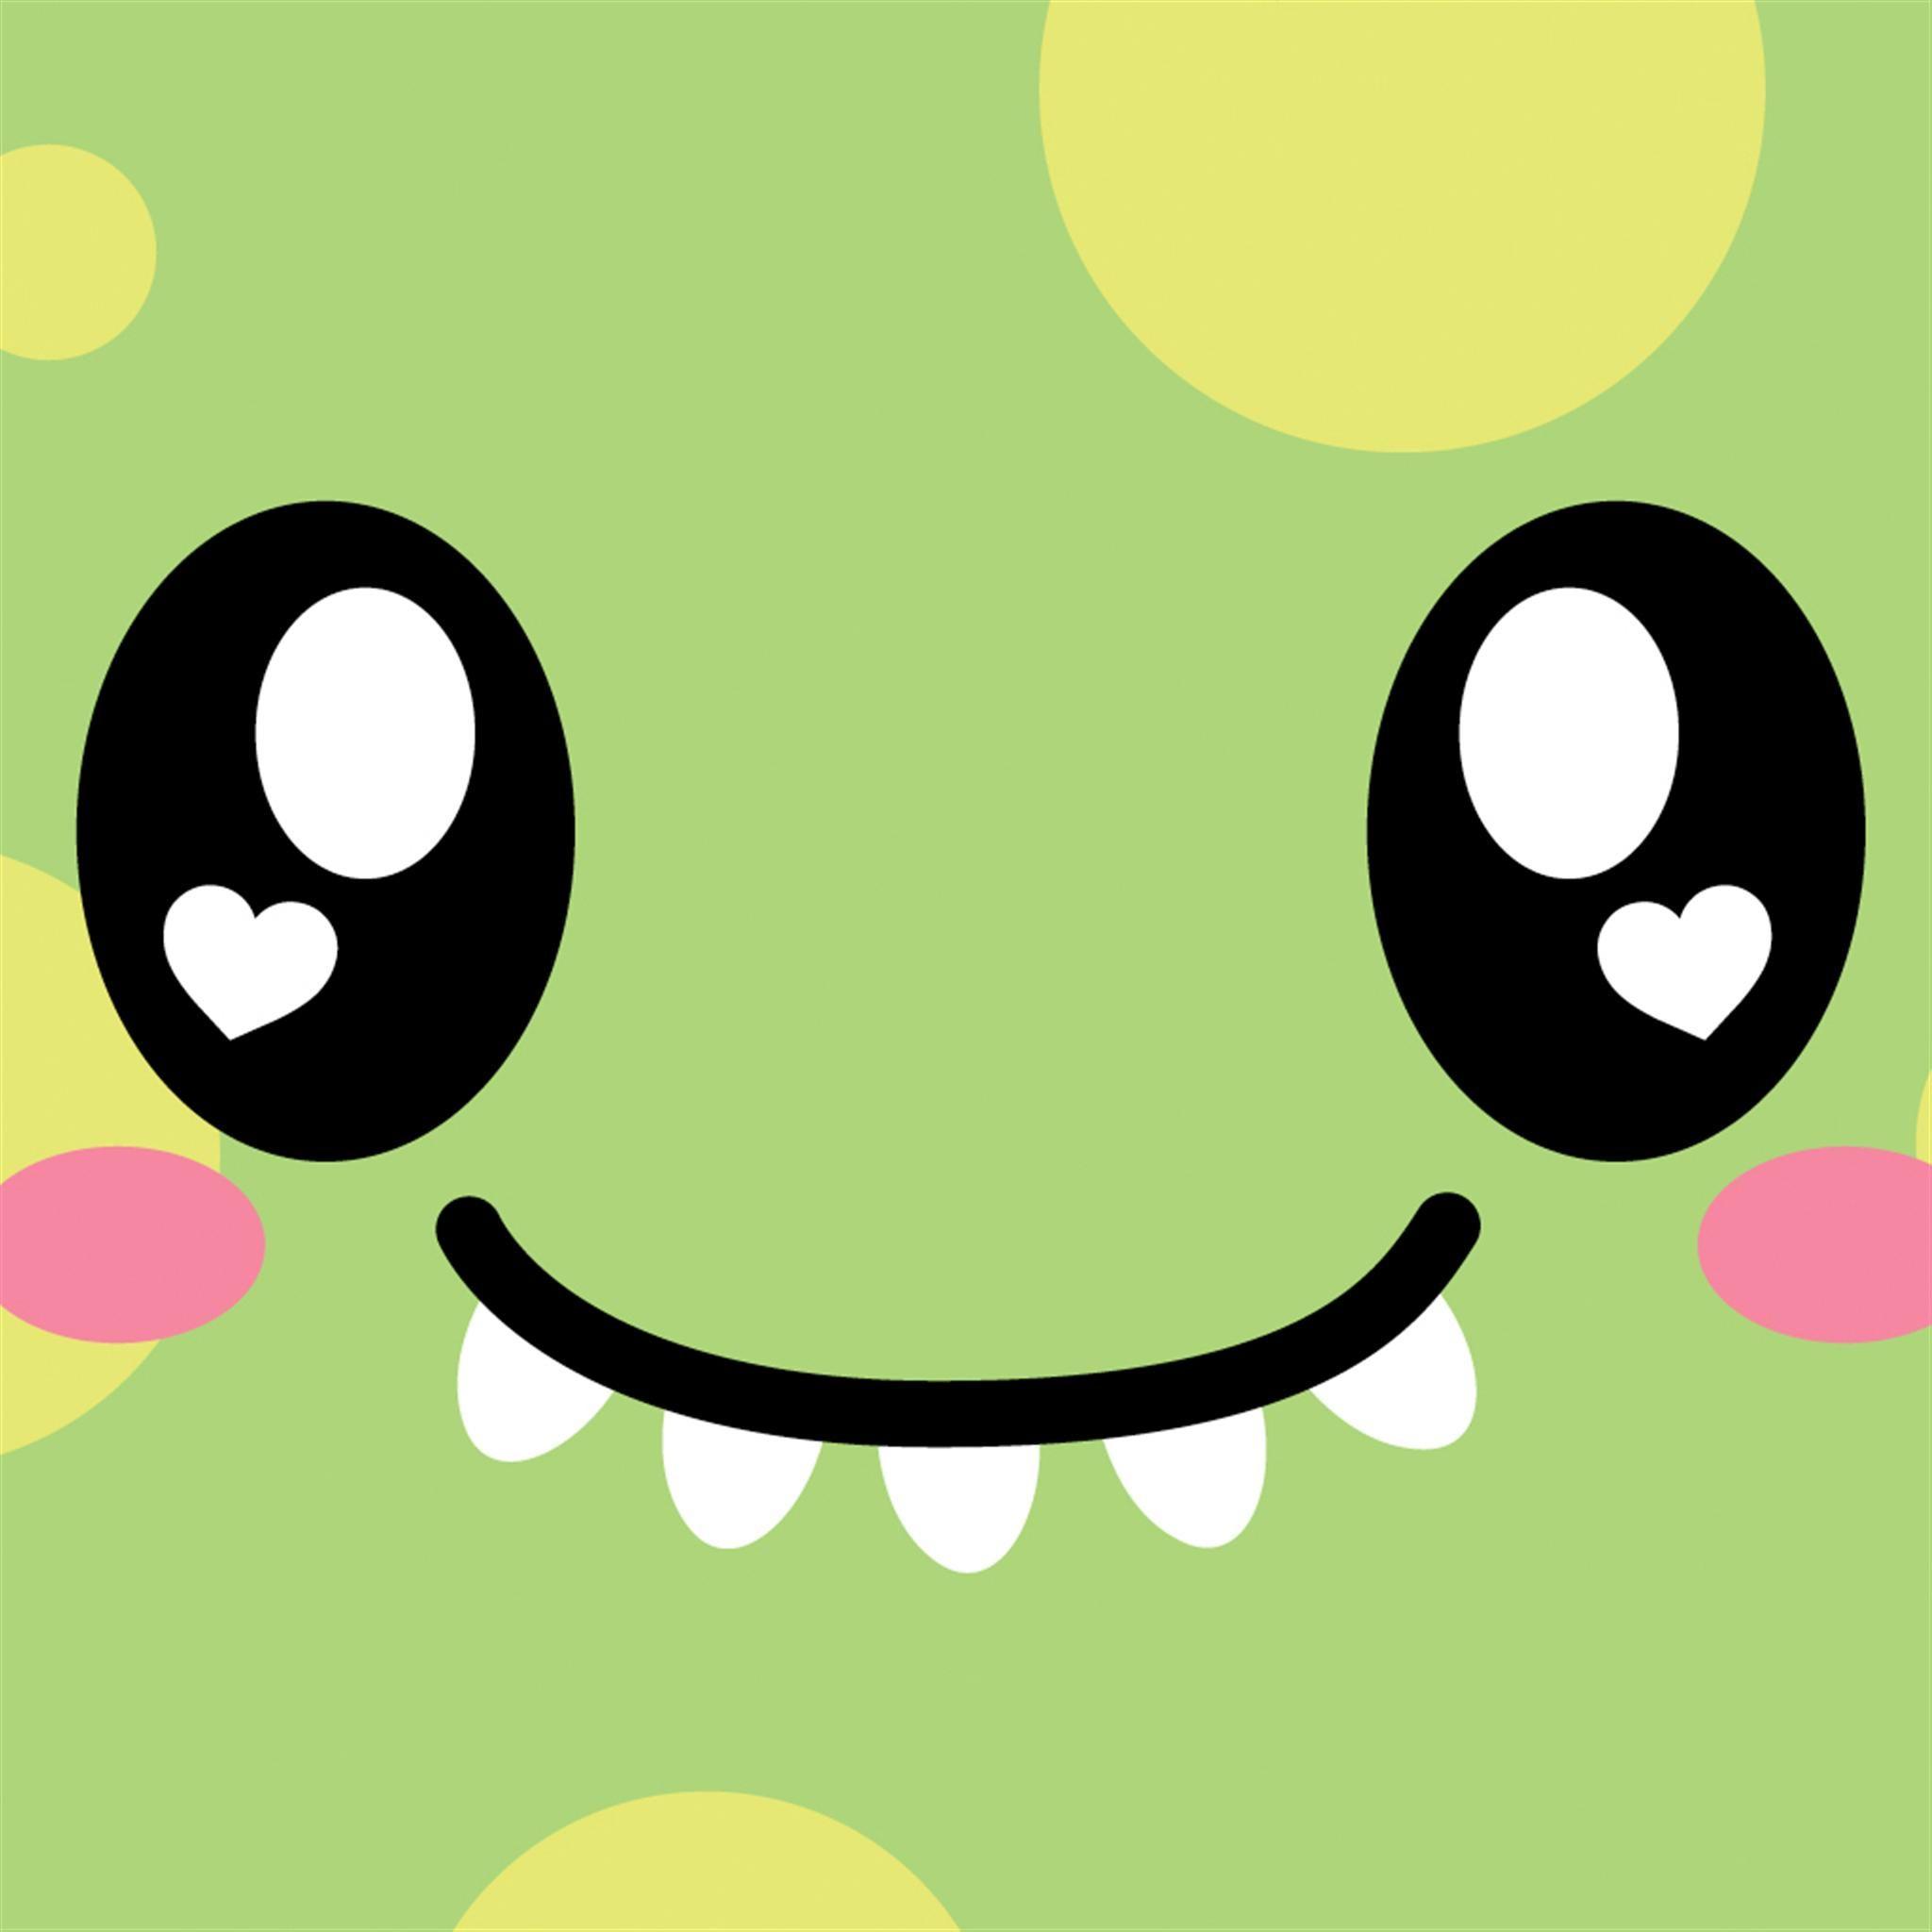 Ipad Mini Cute Wallpaper Google Search Cute Wallpapers For Ipad Cute Girl Wallpaper Ipad Mini Wallpaper